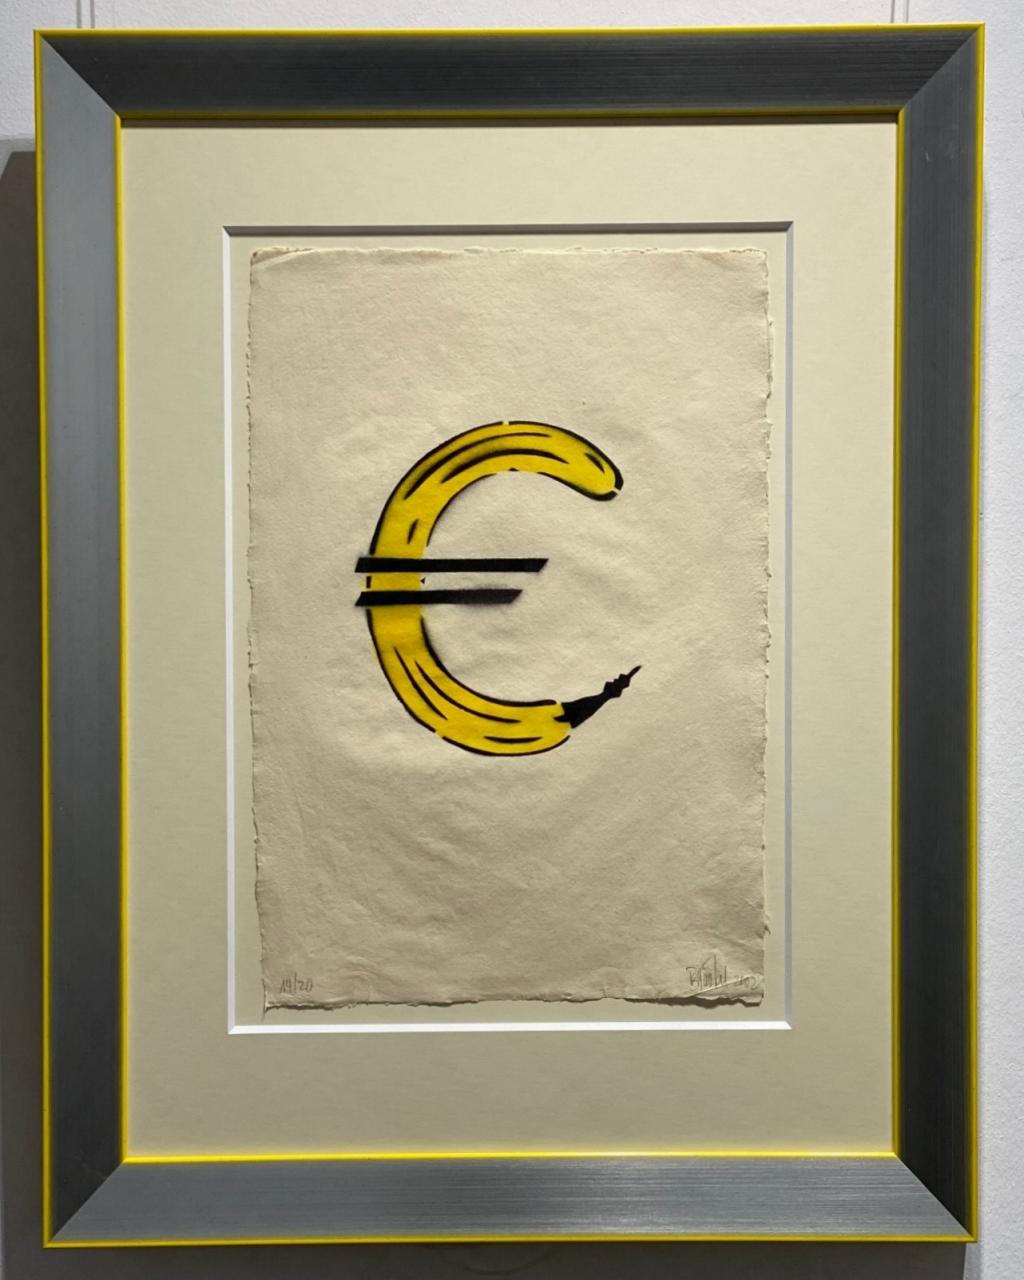 Eurobanane, gerahmt